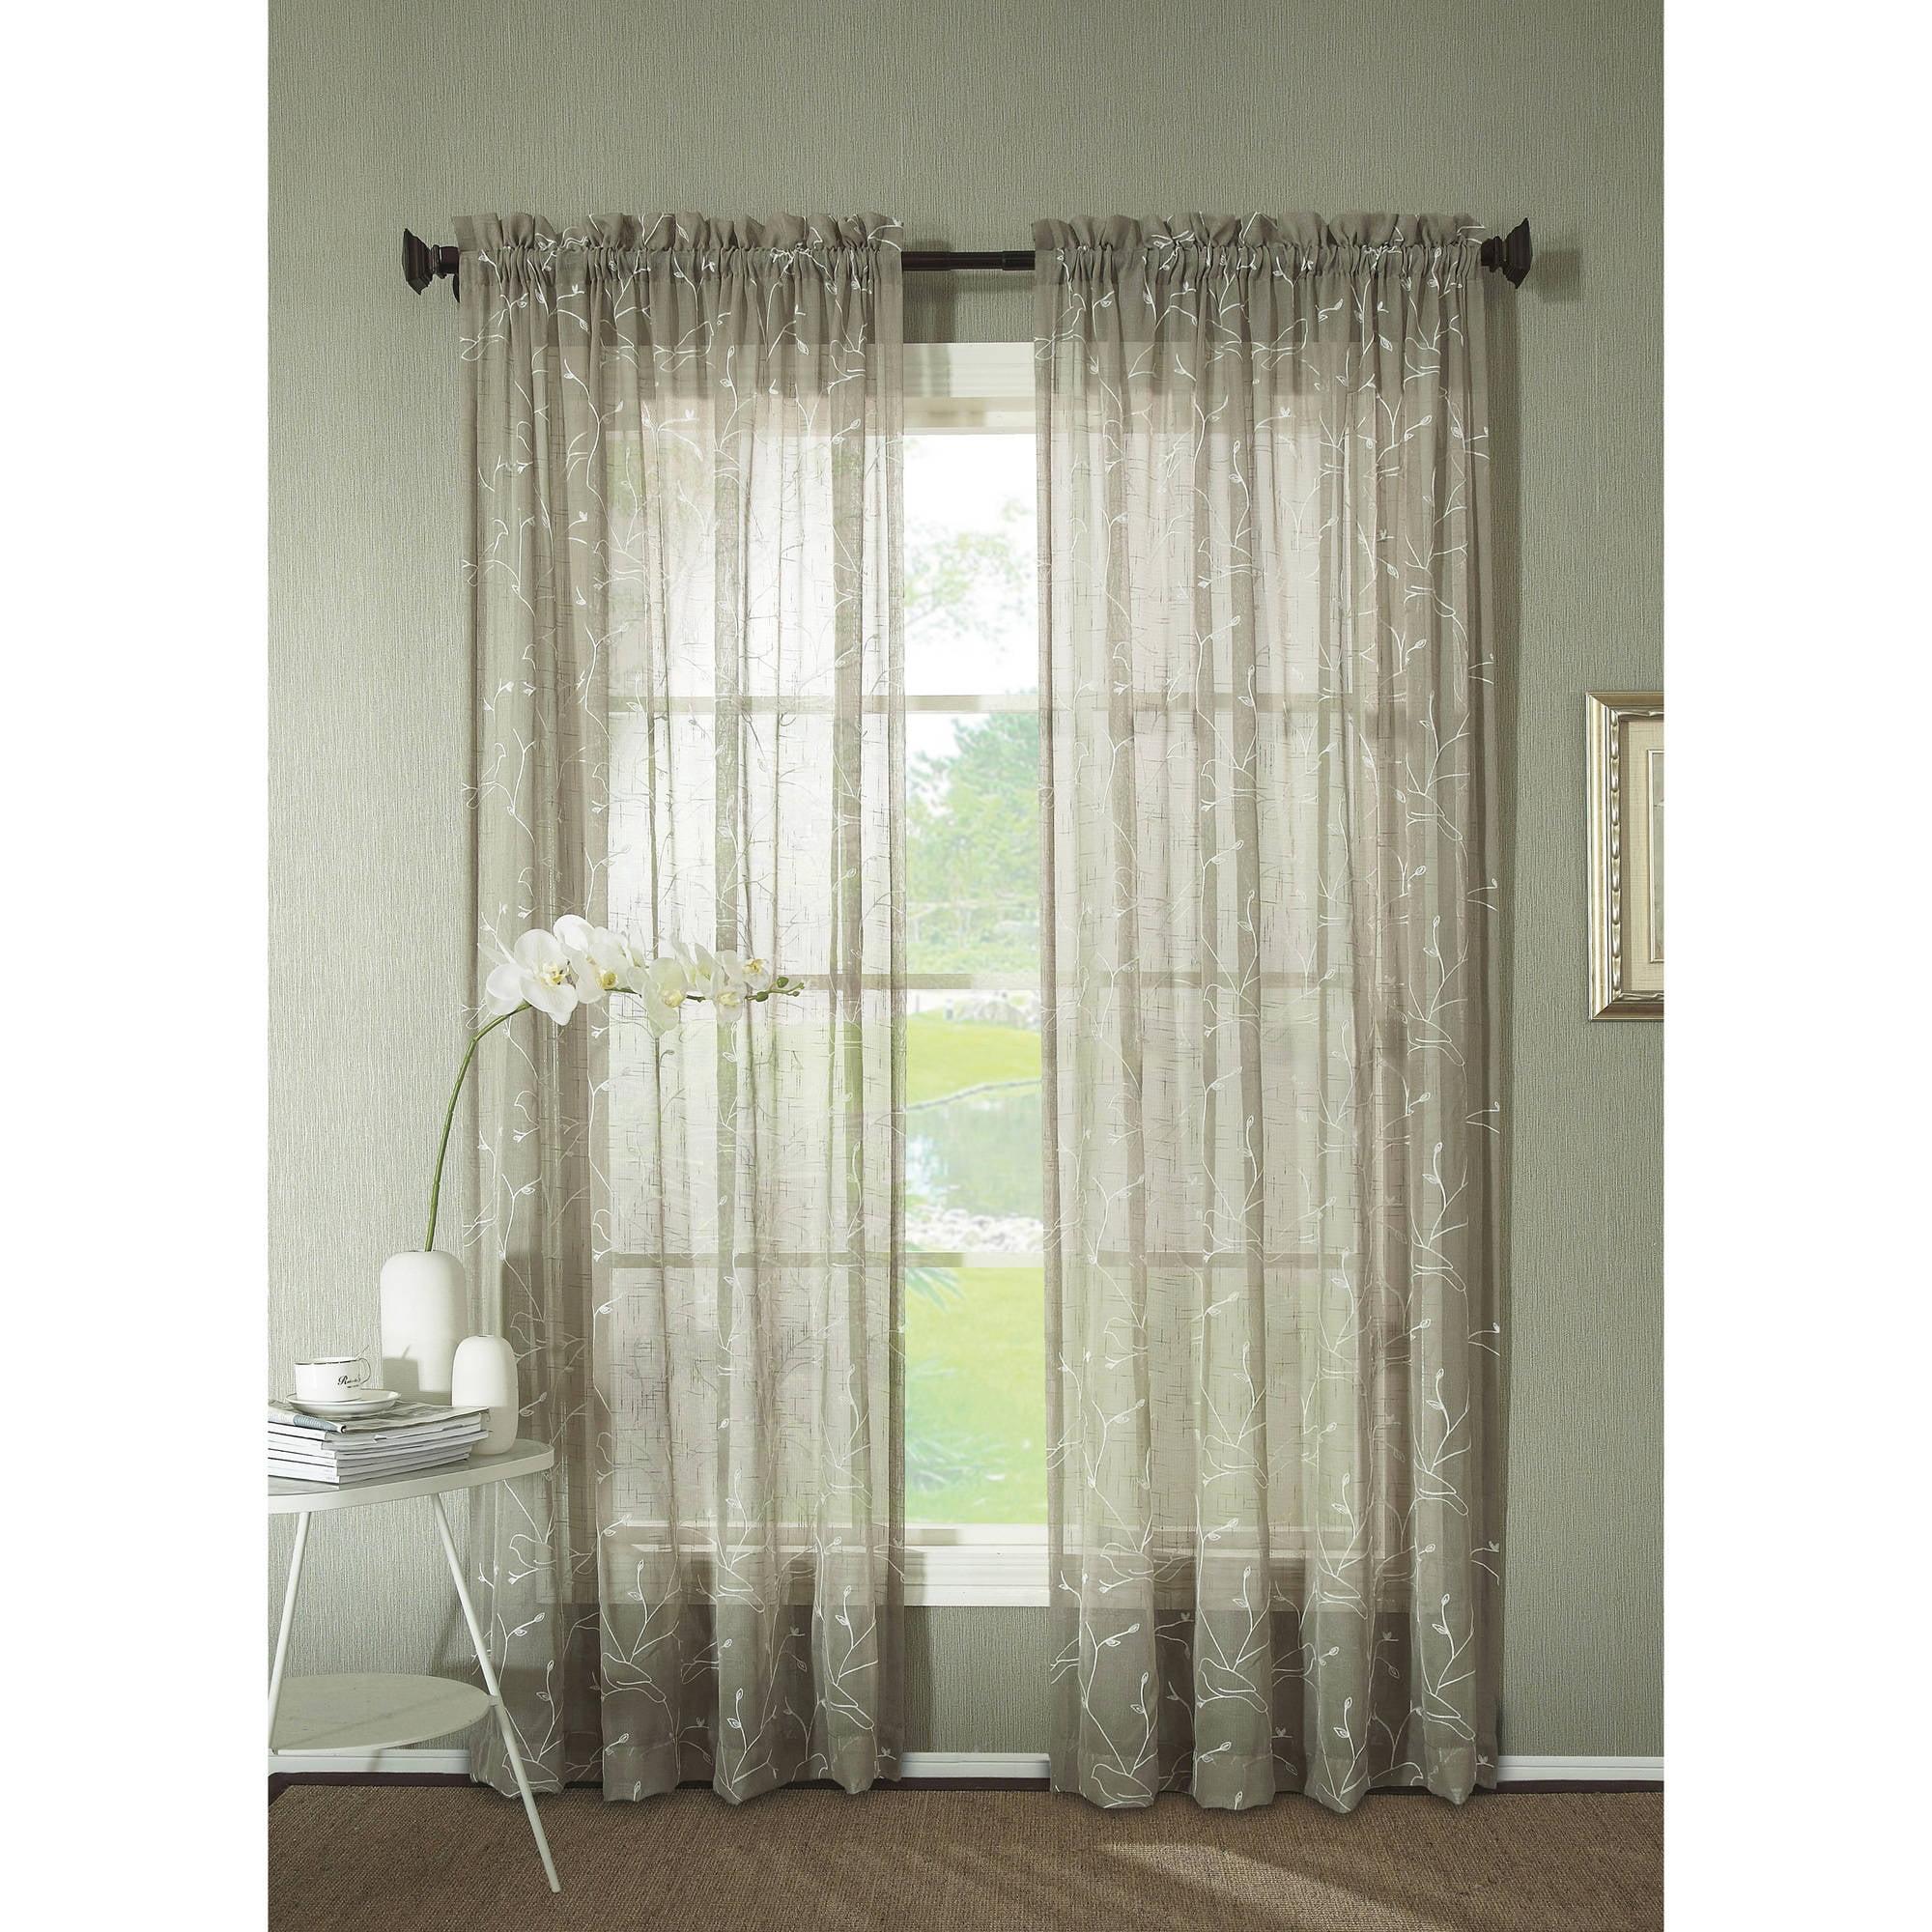 Ideal Better Homes and Gardens Sheer Trellis Curtain Panel, Green  QQ56